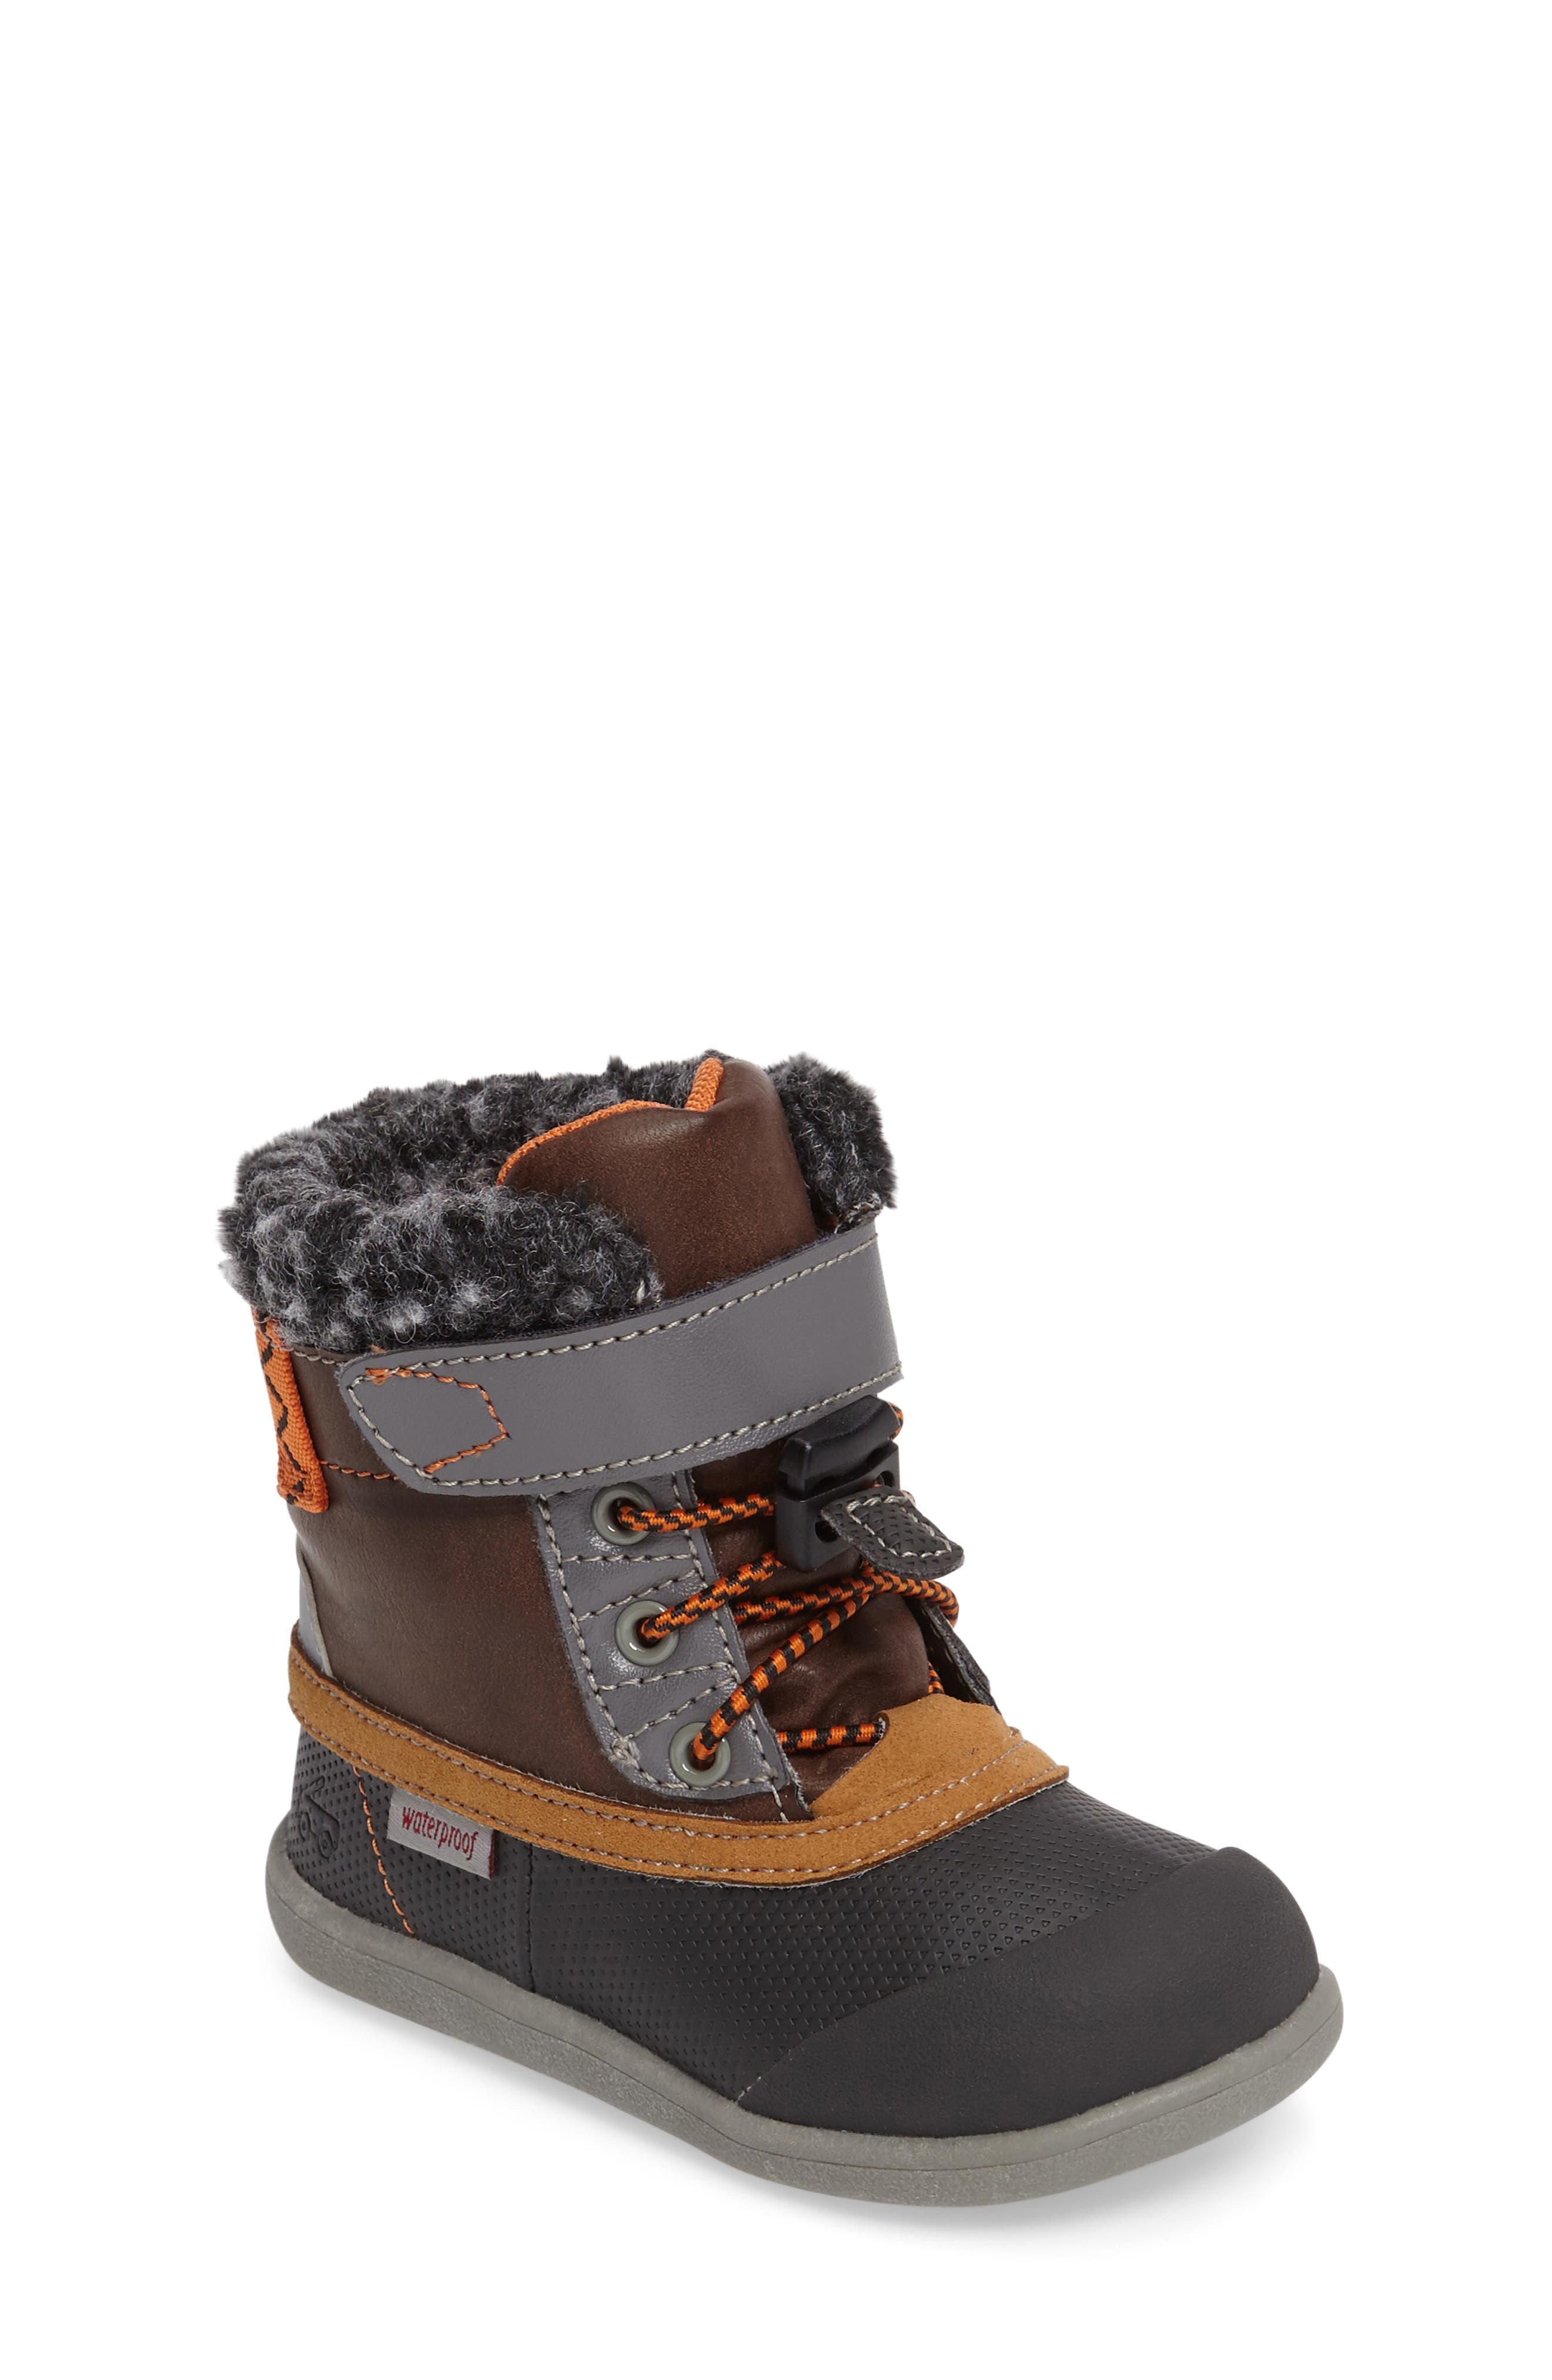 Jack Waterproof Boot,                         Main,                         color, 200